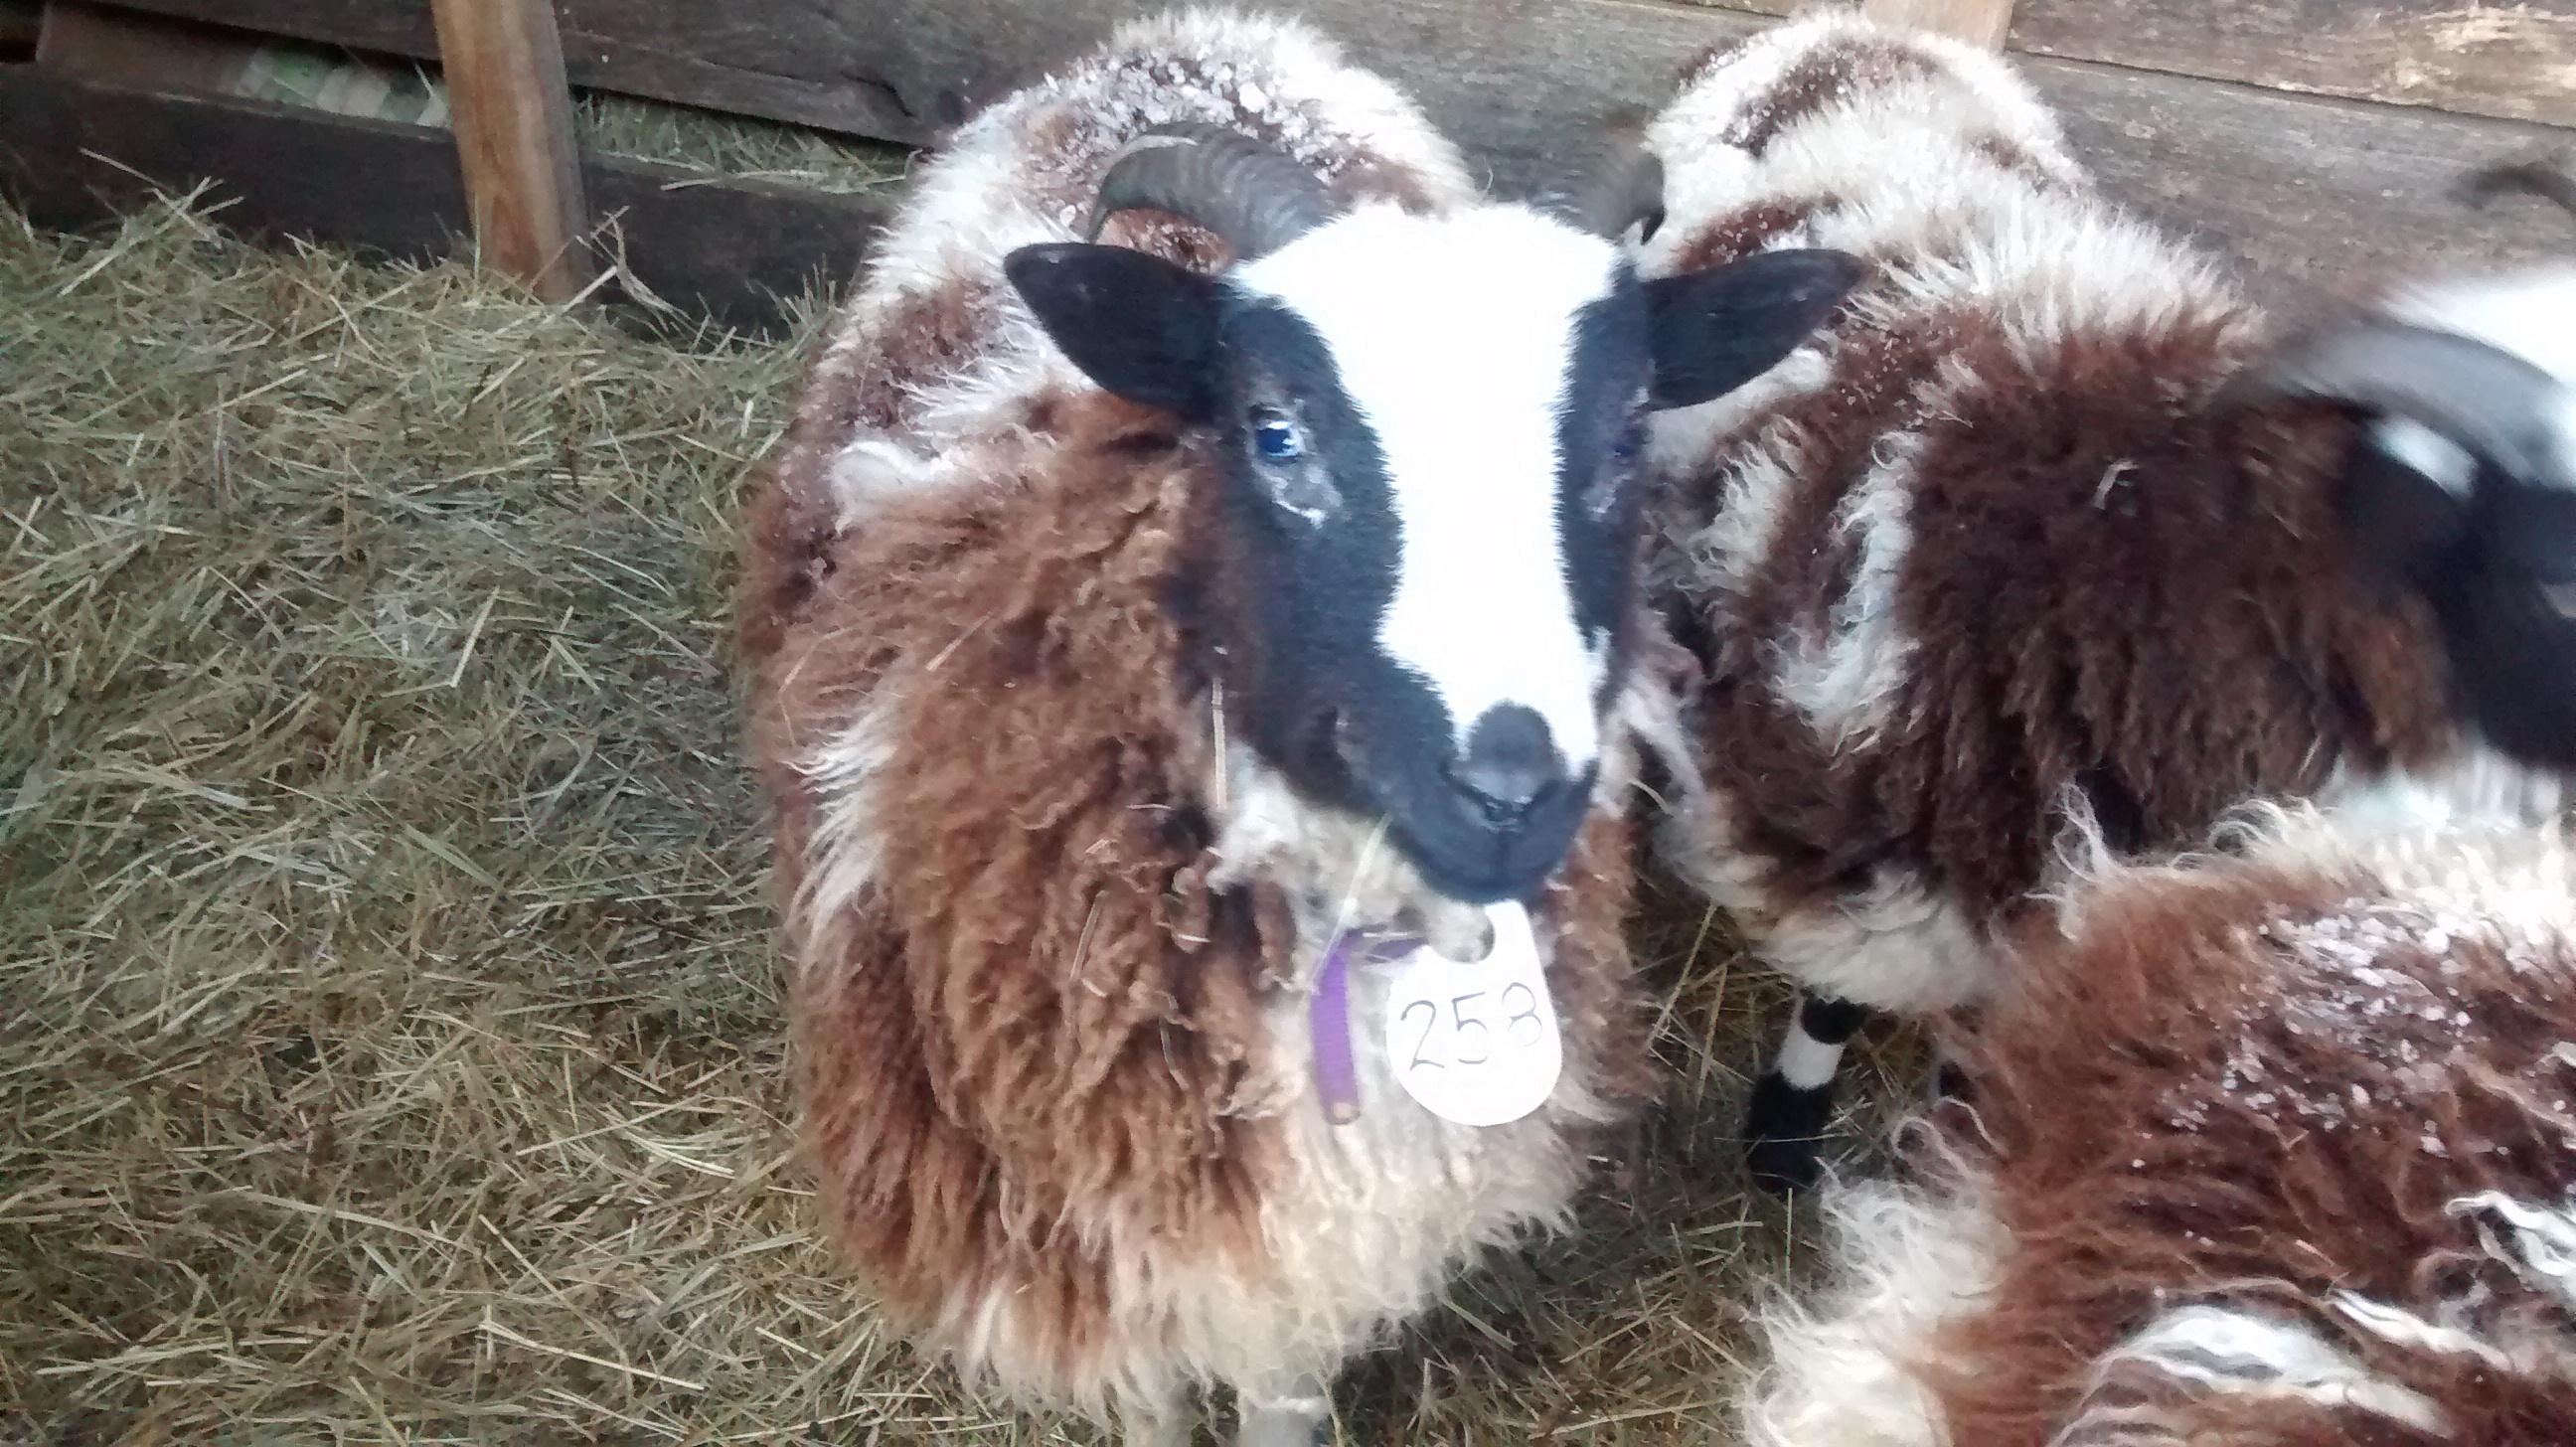 Sheep losing wool around eyes (goats forum at permies)